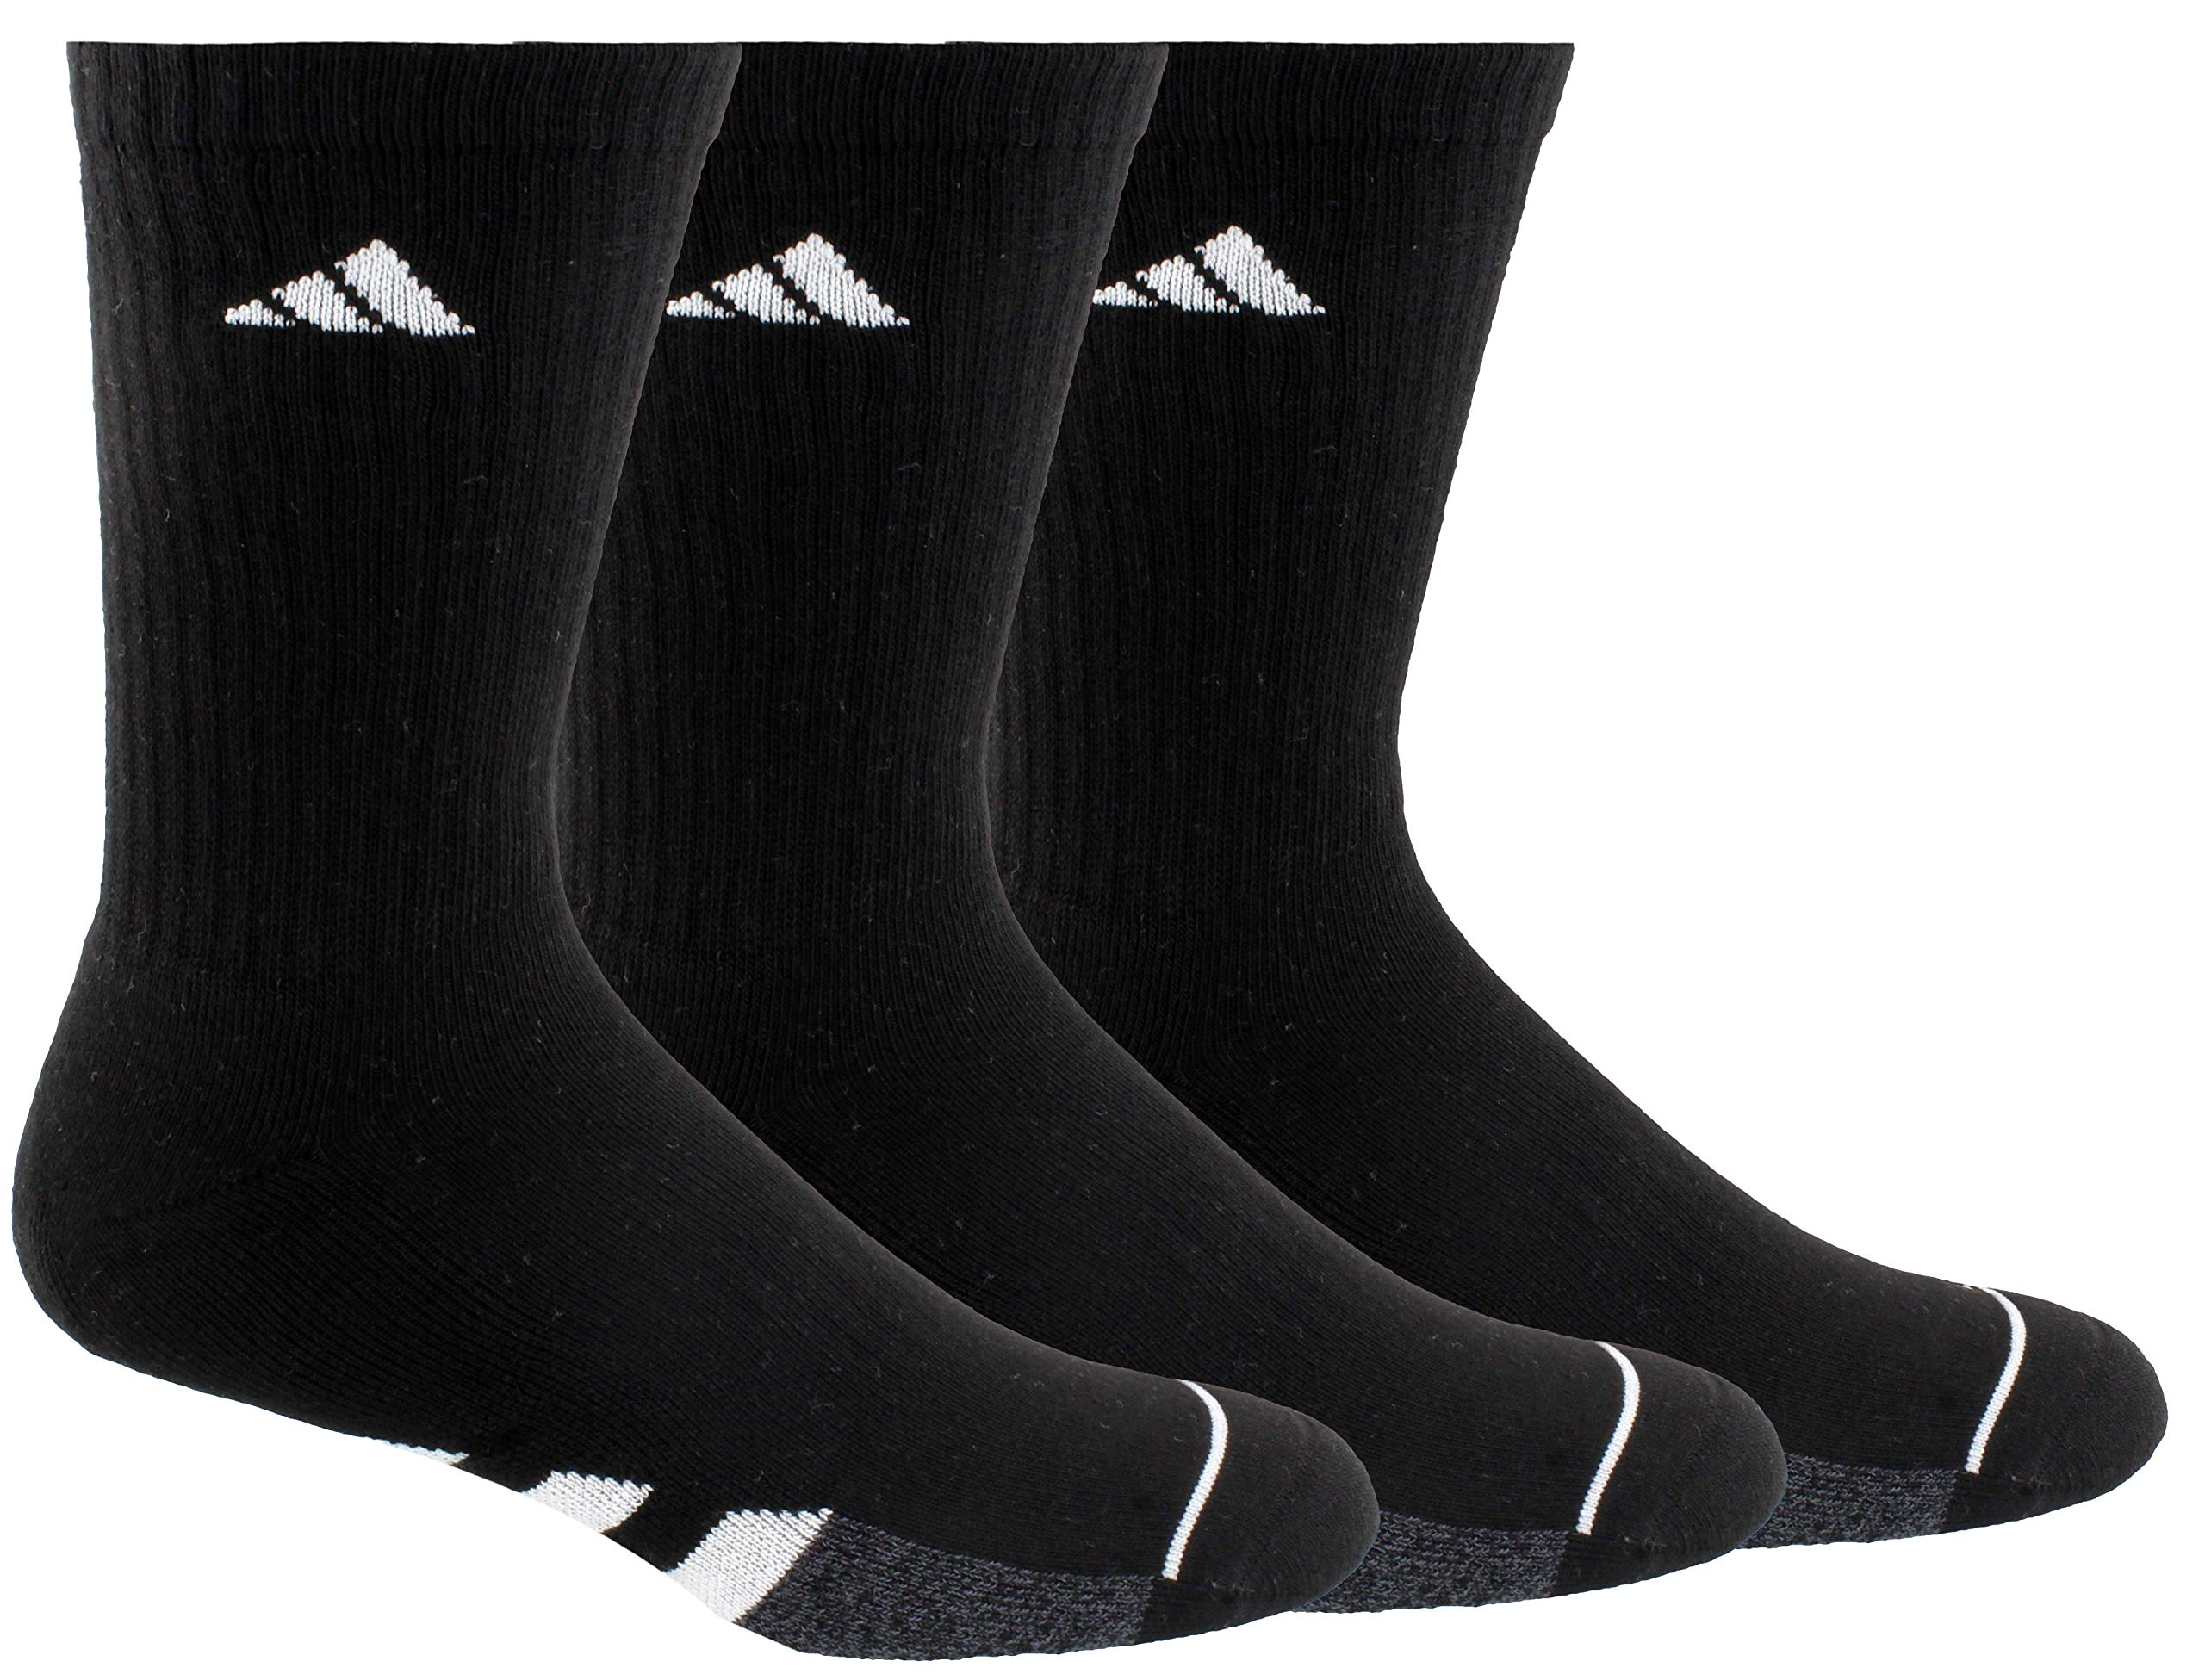 adidas Men's Cushioned Crew Socks (3-Pair), Black/White/Black - Onix Marl, XL, (Shoe Size 12-16) by adidas